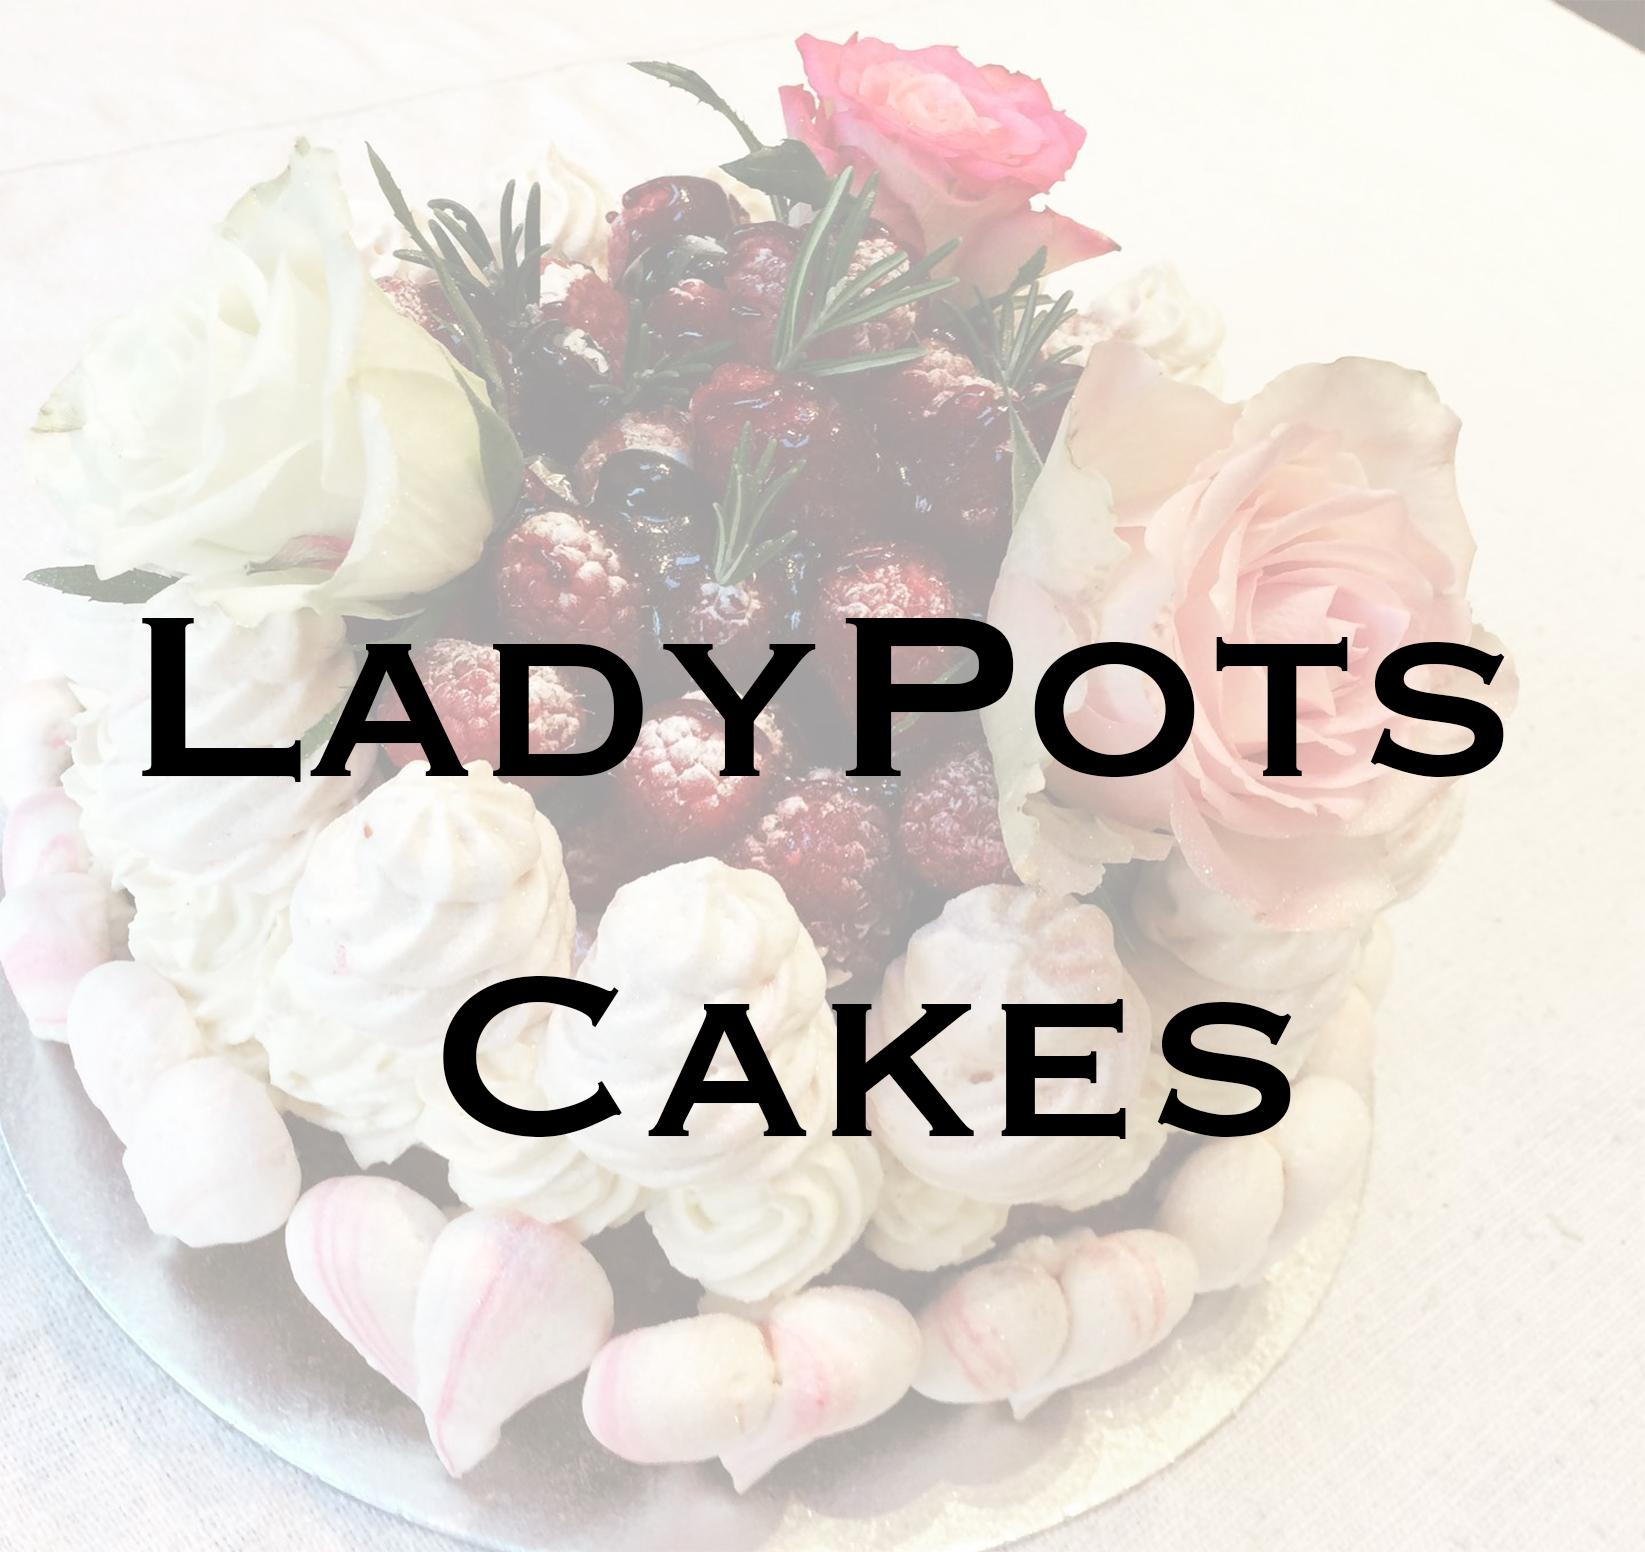 LadyPots Cakes